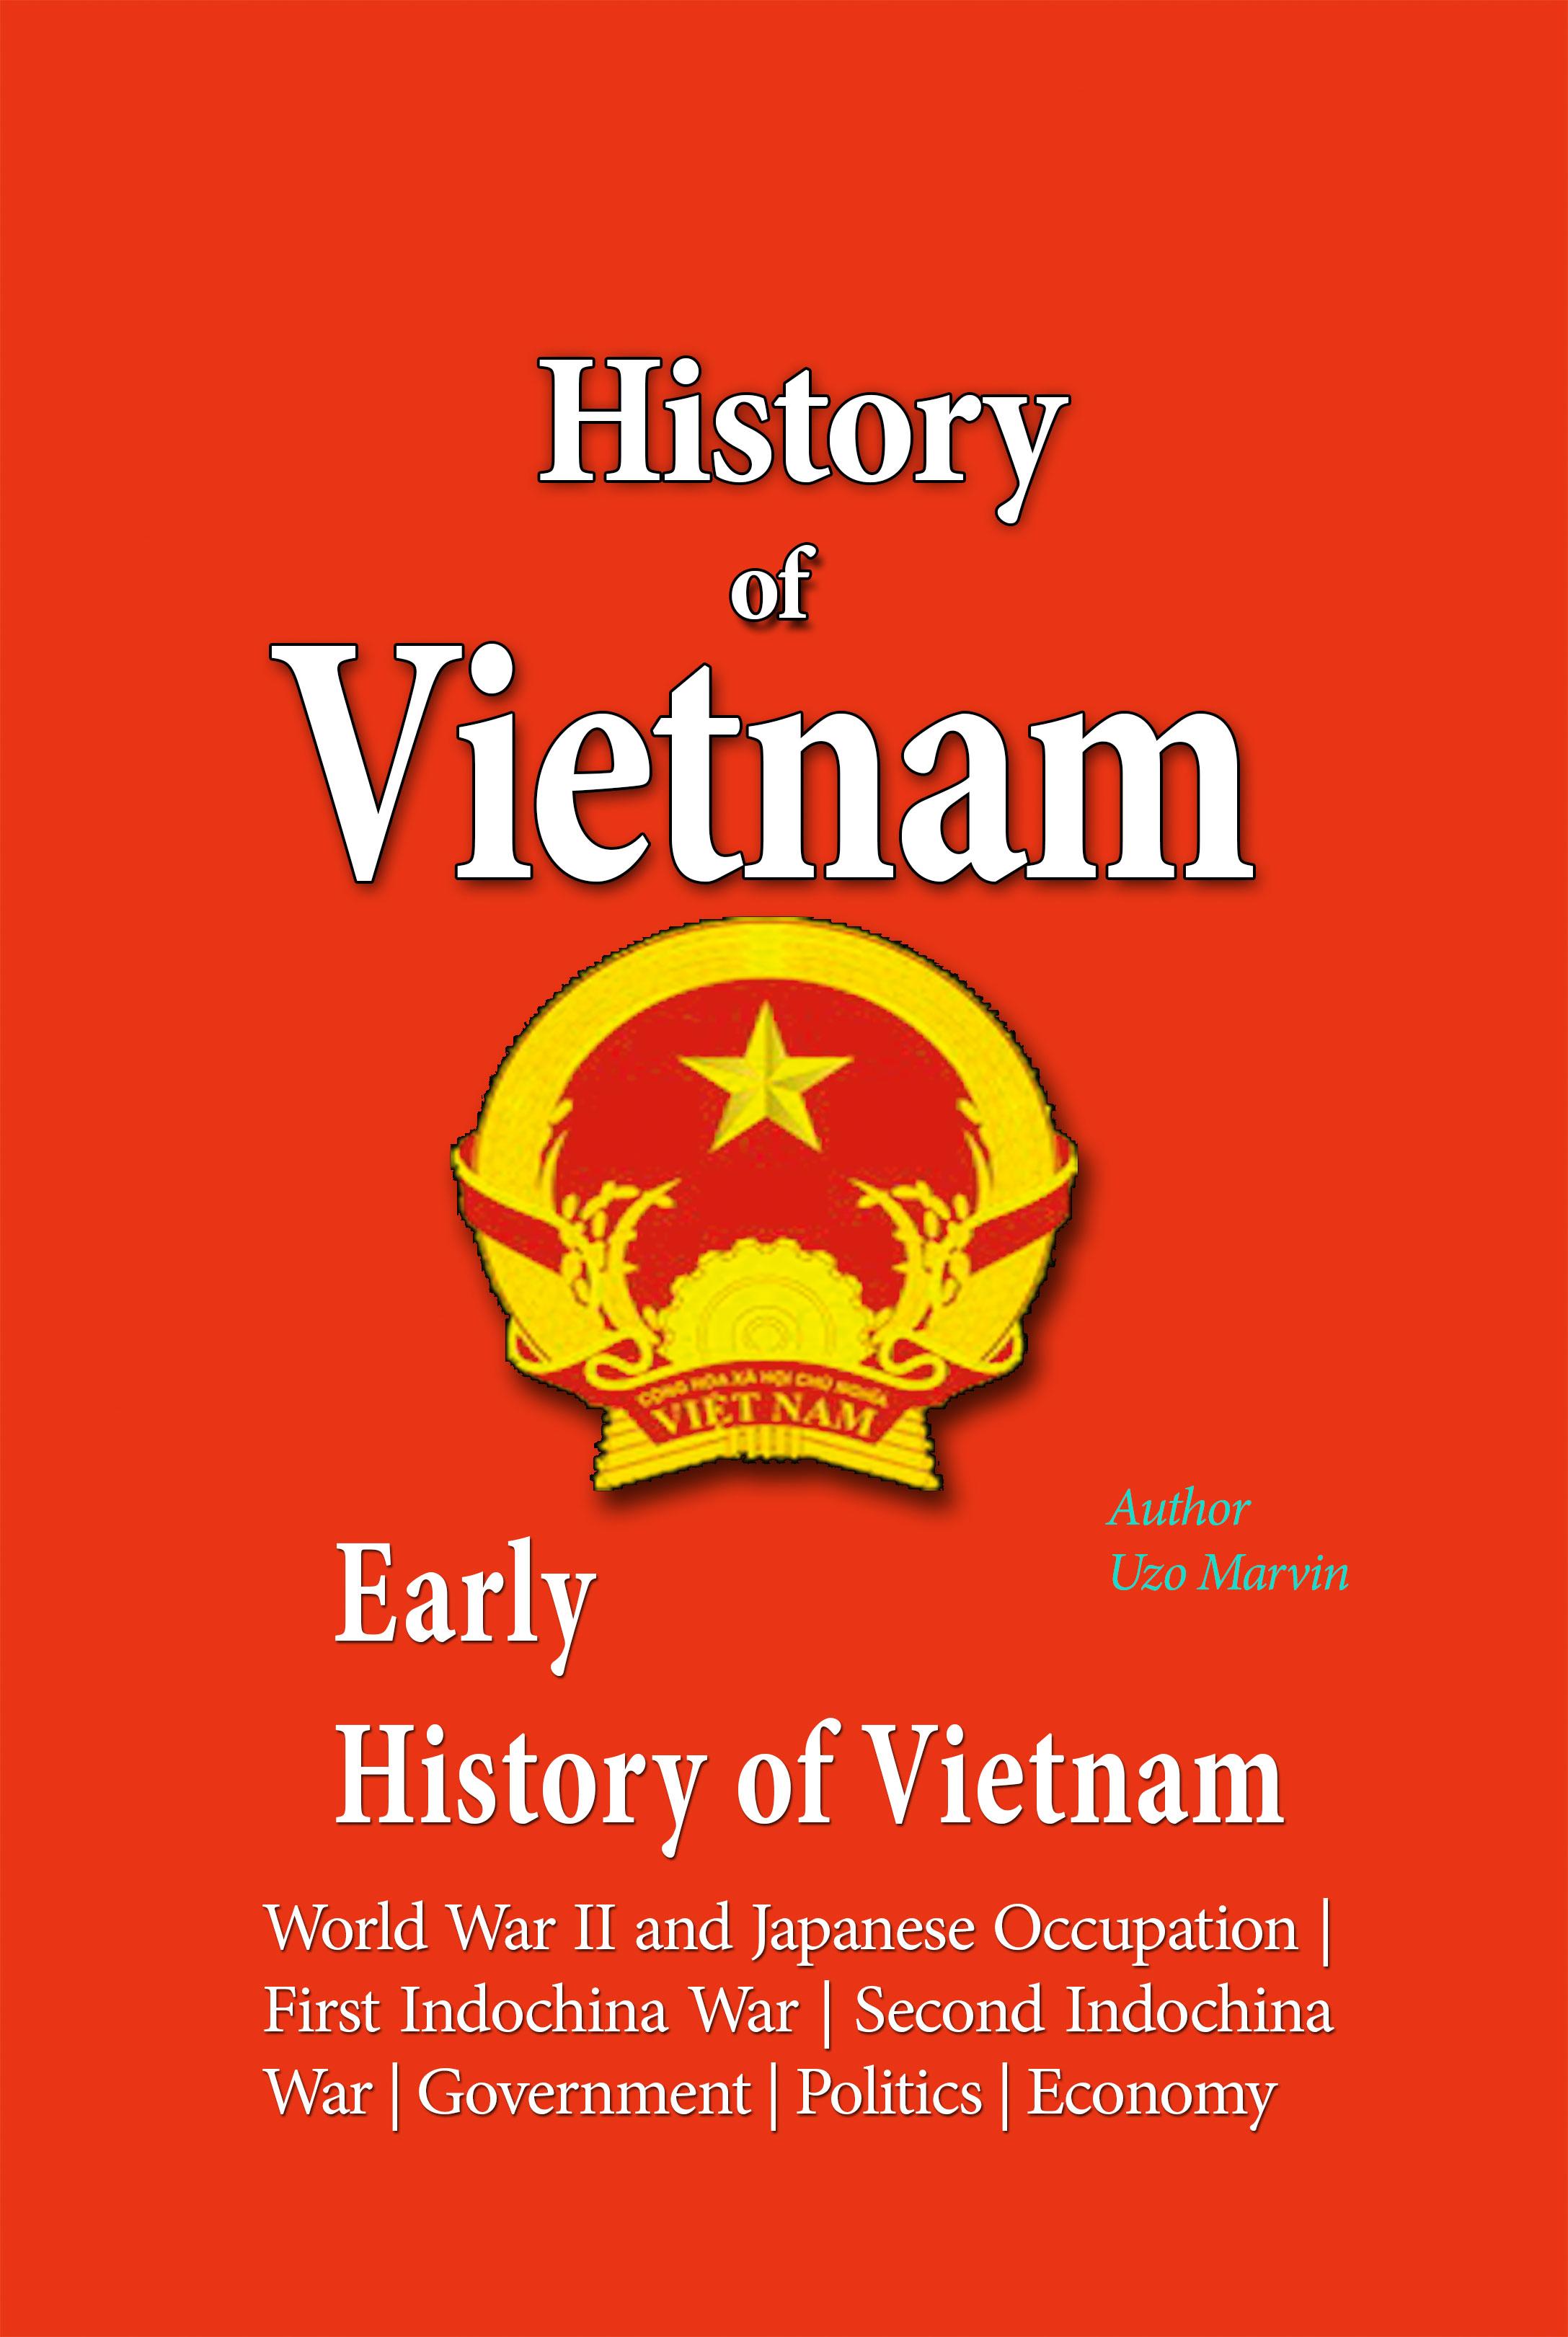 a history of vietnam